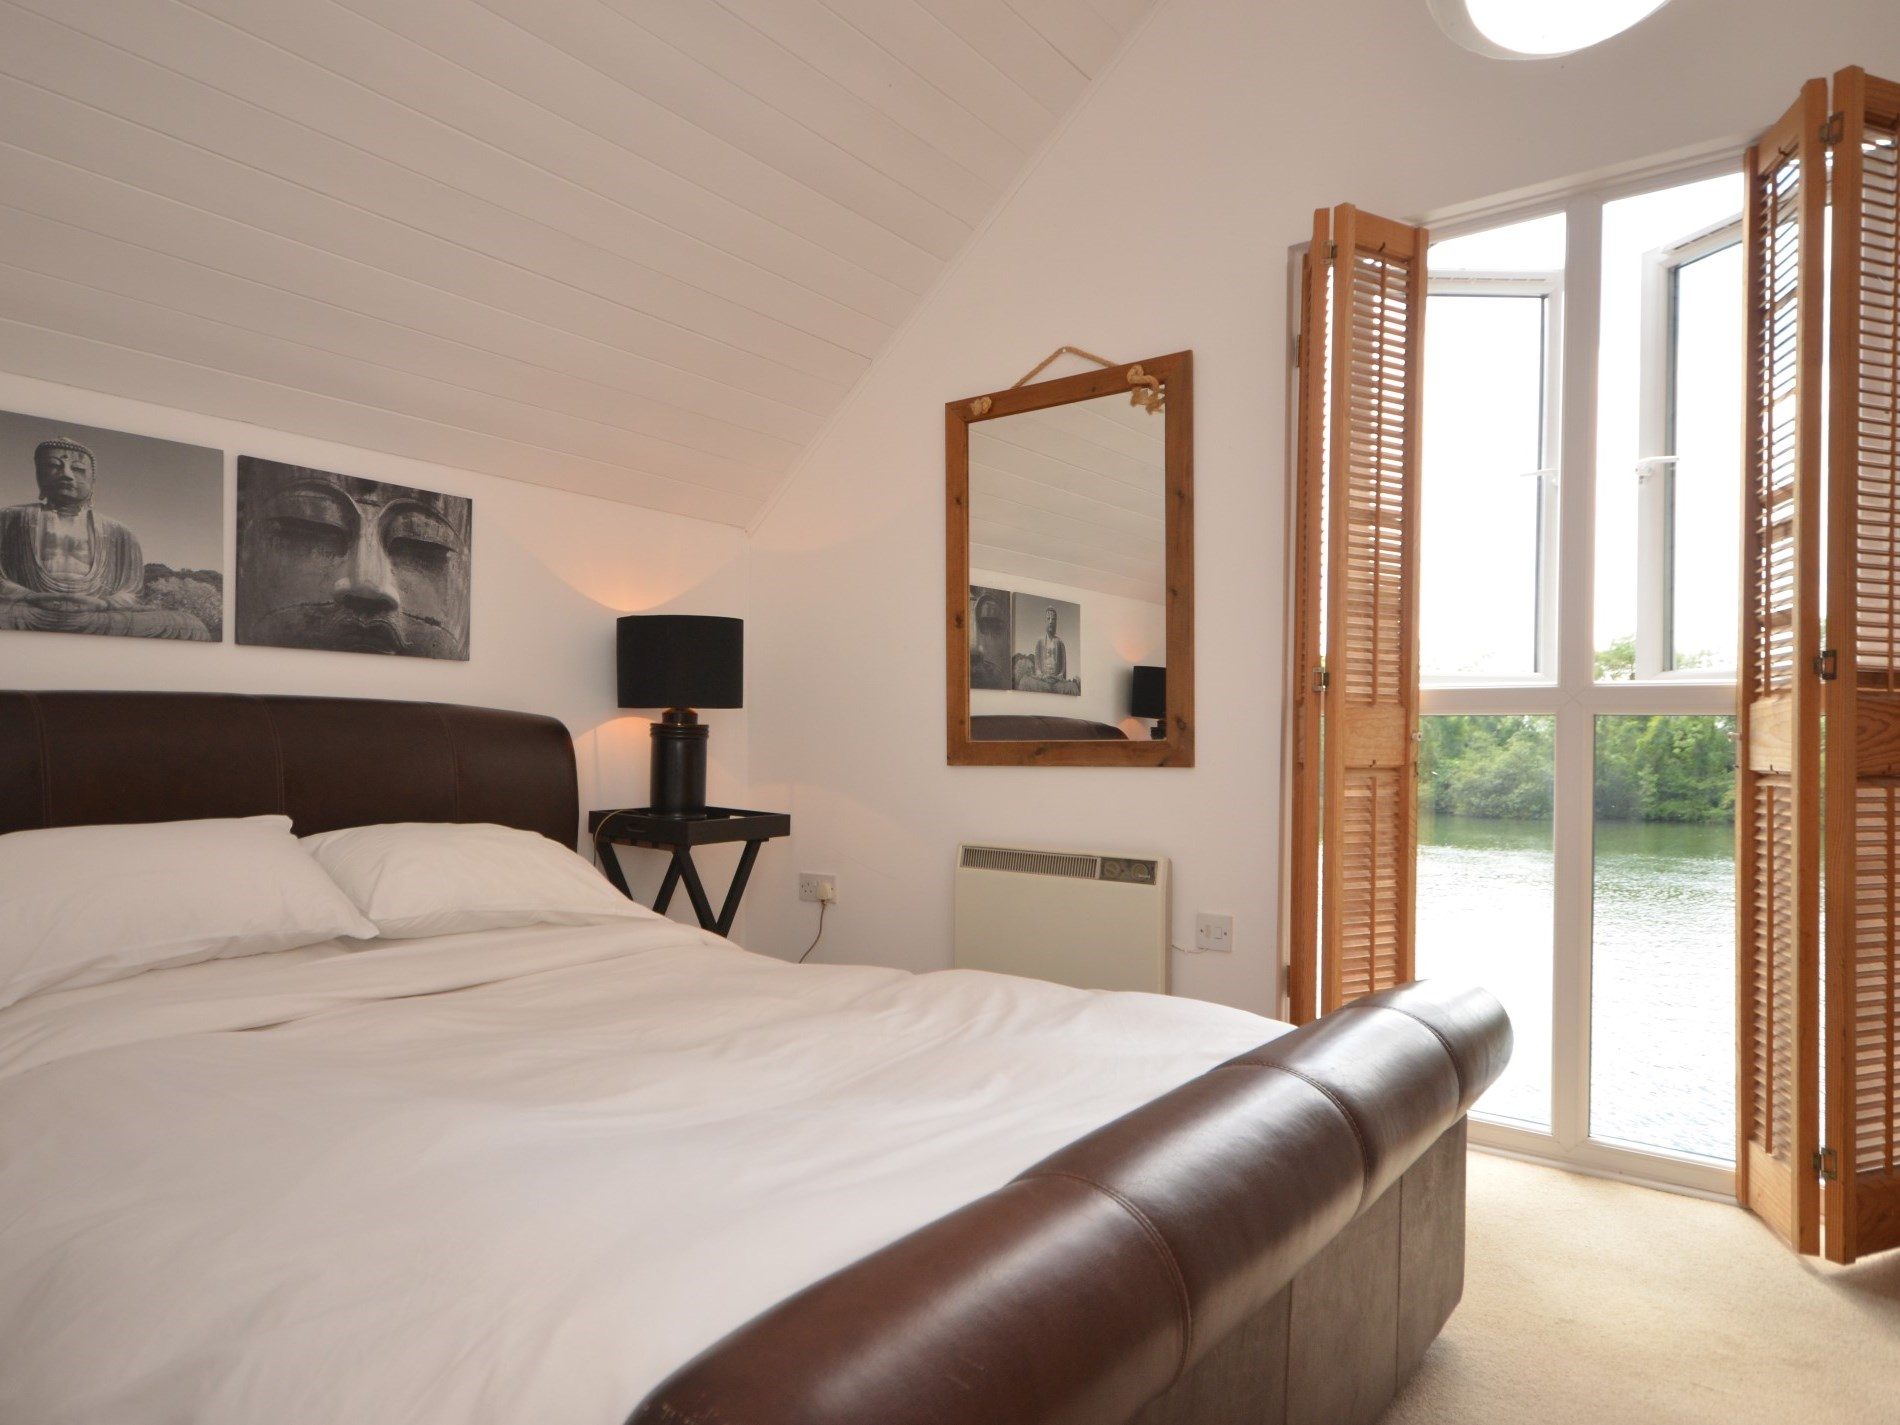 King sized bedroom with wonderful lake views